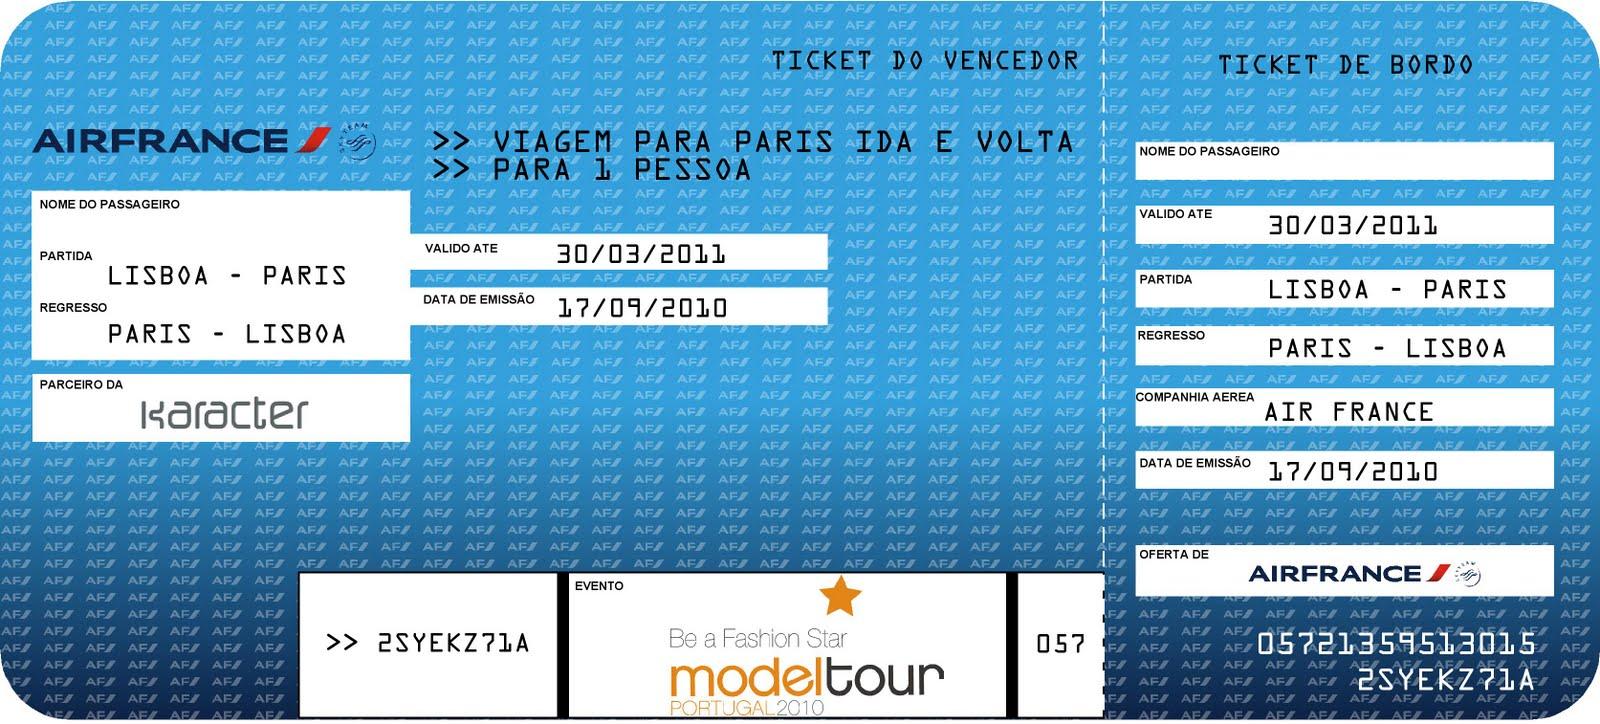 sara pozzetti u0026 39 s portfolio  air france ticket prize for modeltour model of the year contest